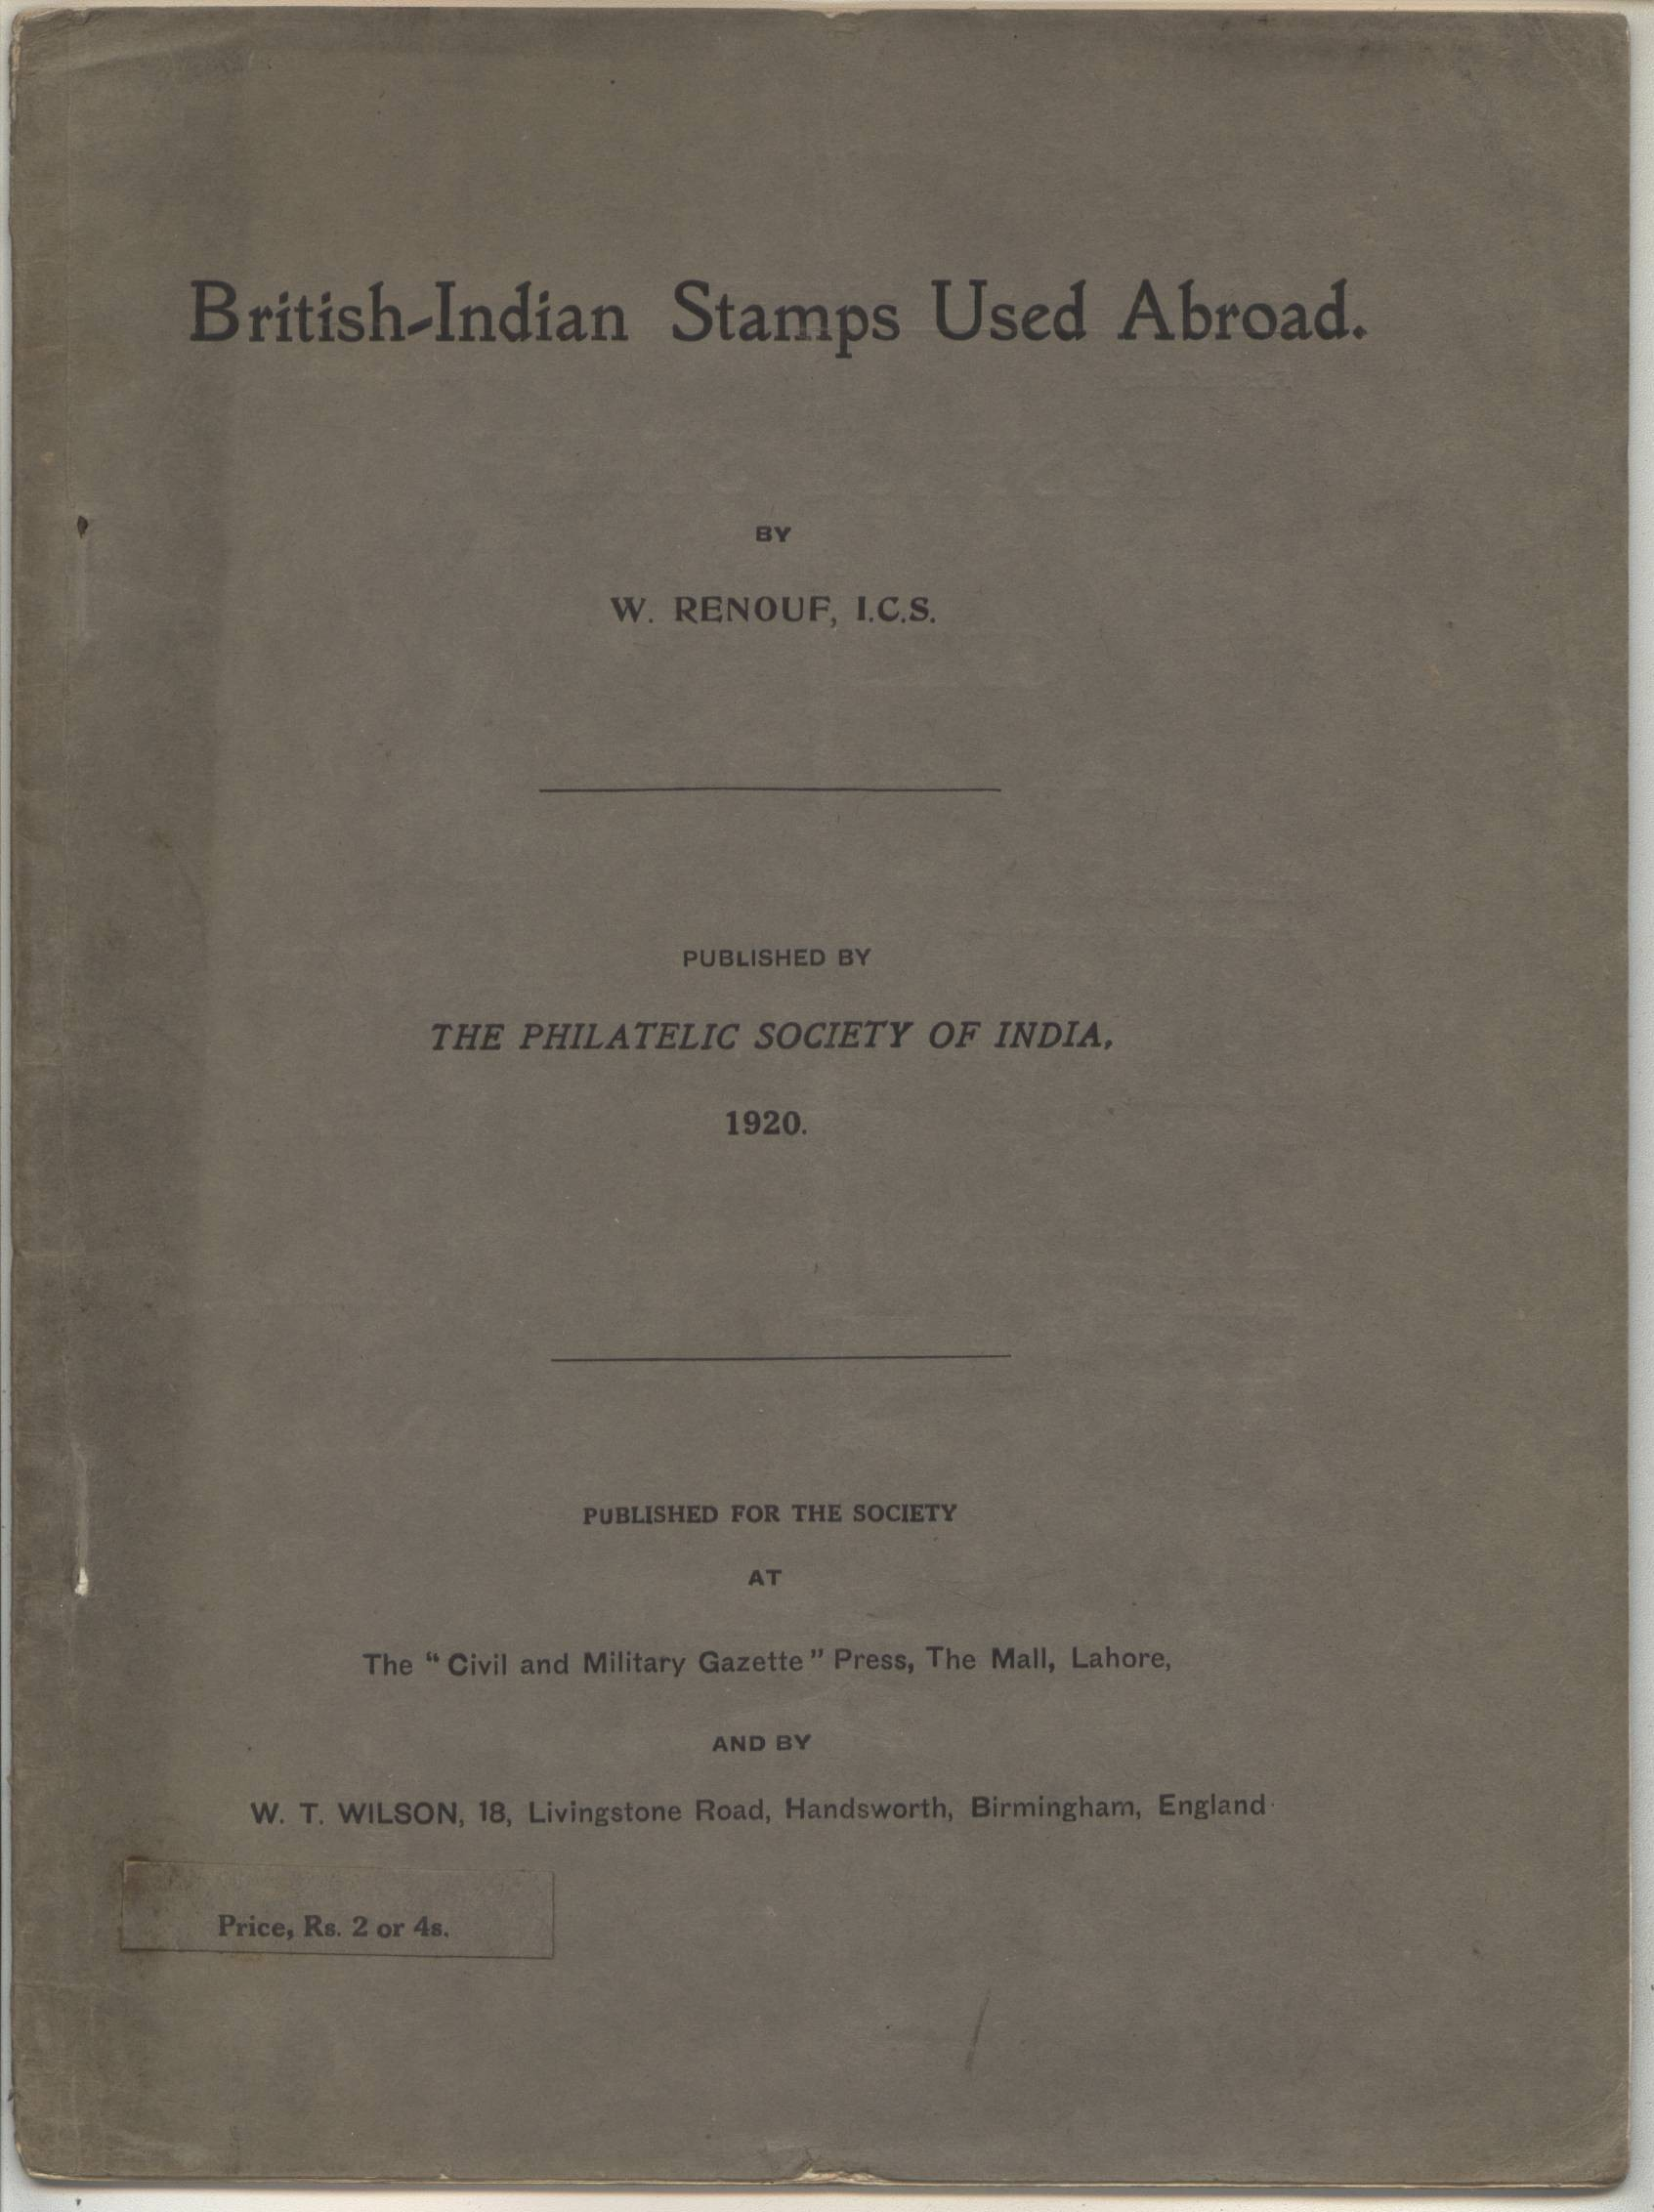 India Used Abroad W. Renouf Main